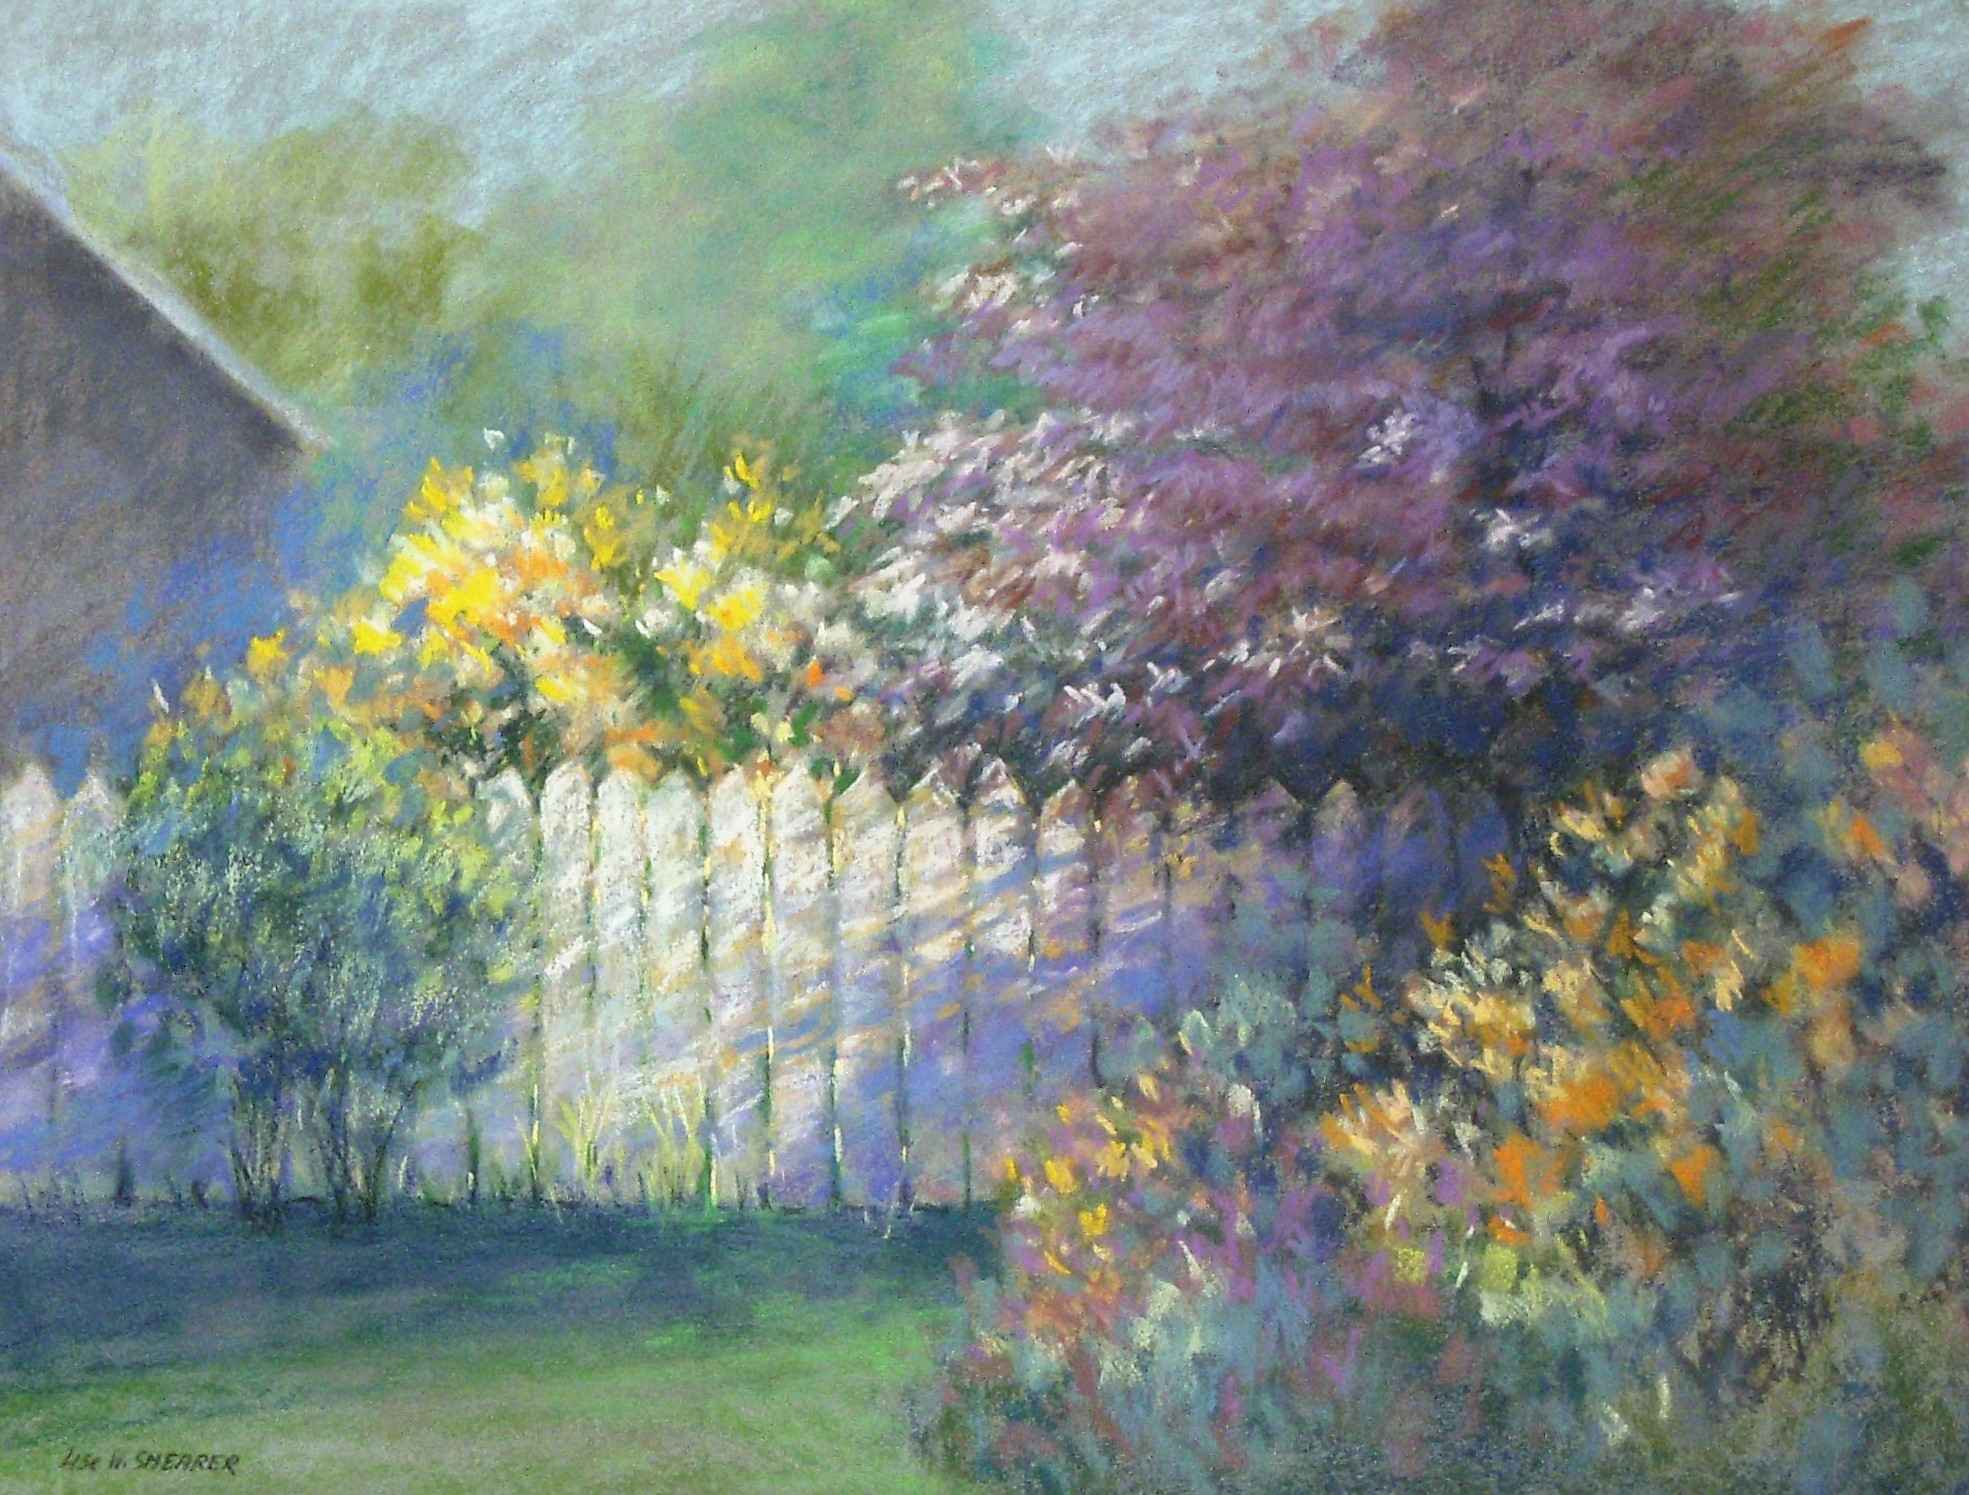 Unknown (Garden fence) by  Lise Shearer - Masterpiece Online